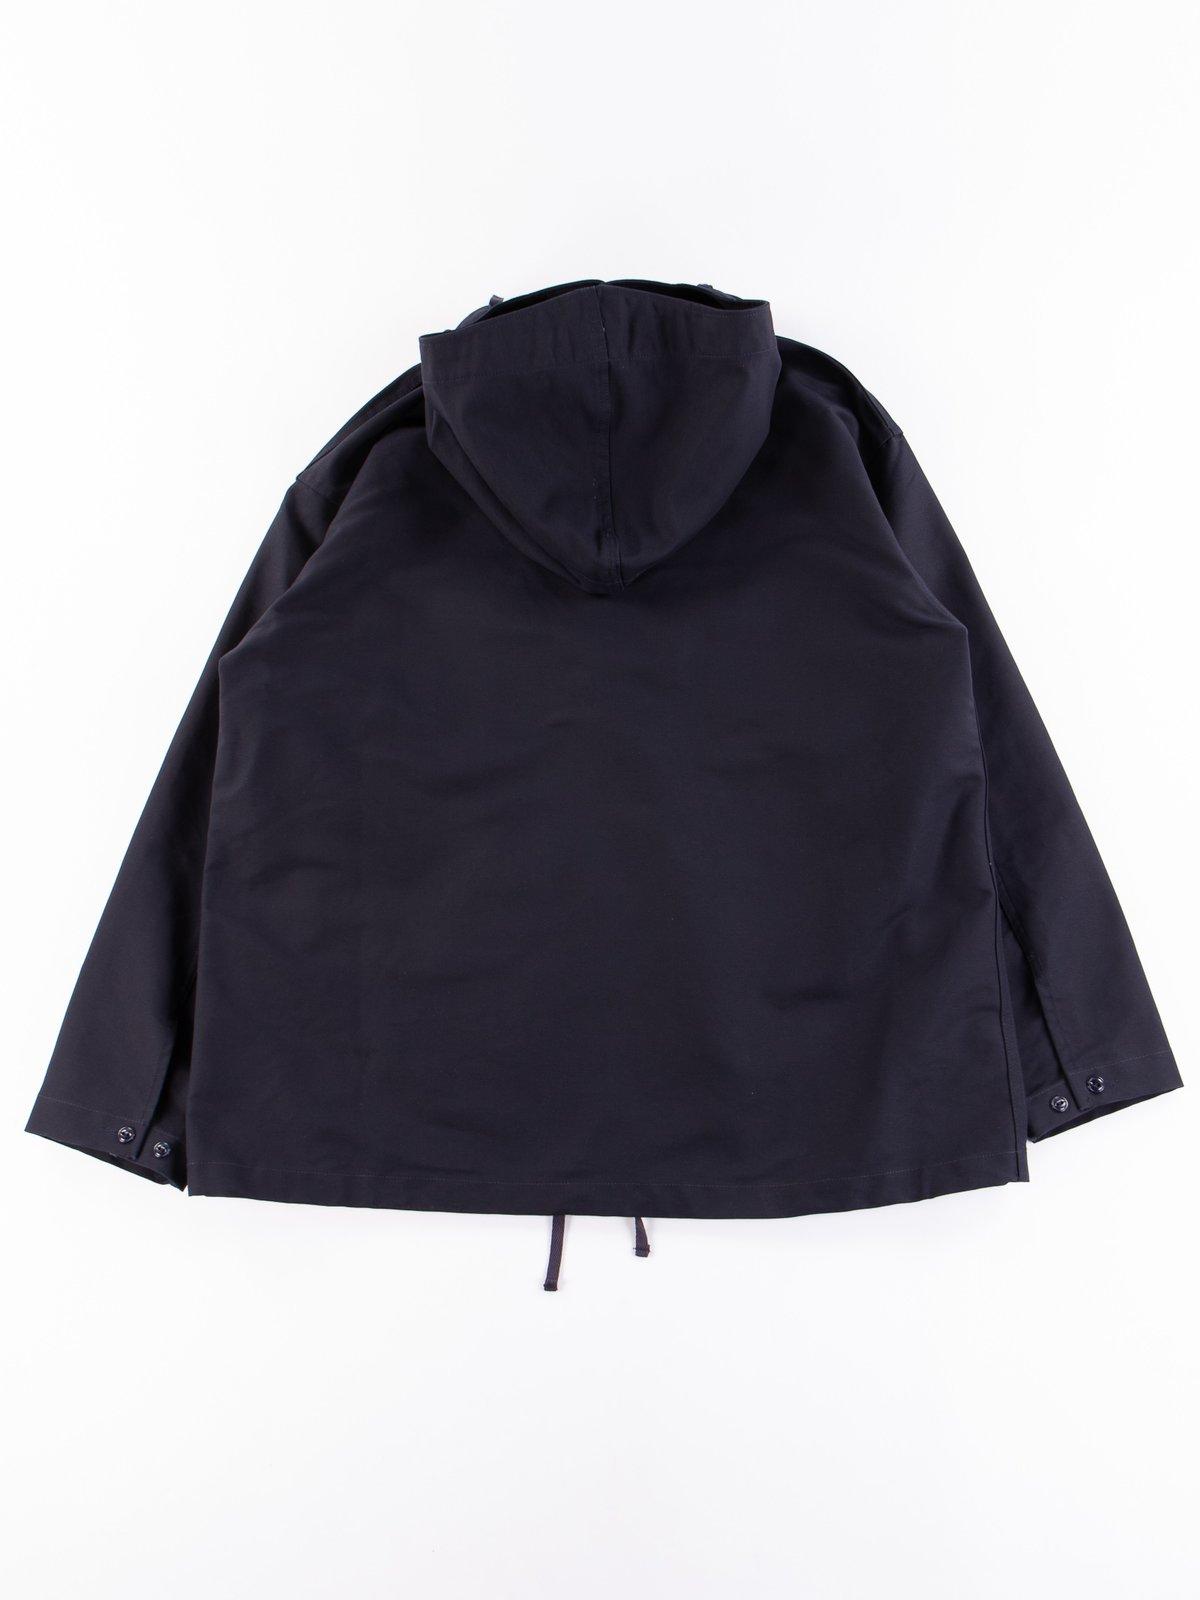 Navy Cotton Double Cloth Cagoule Shirt - Image 7